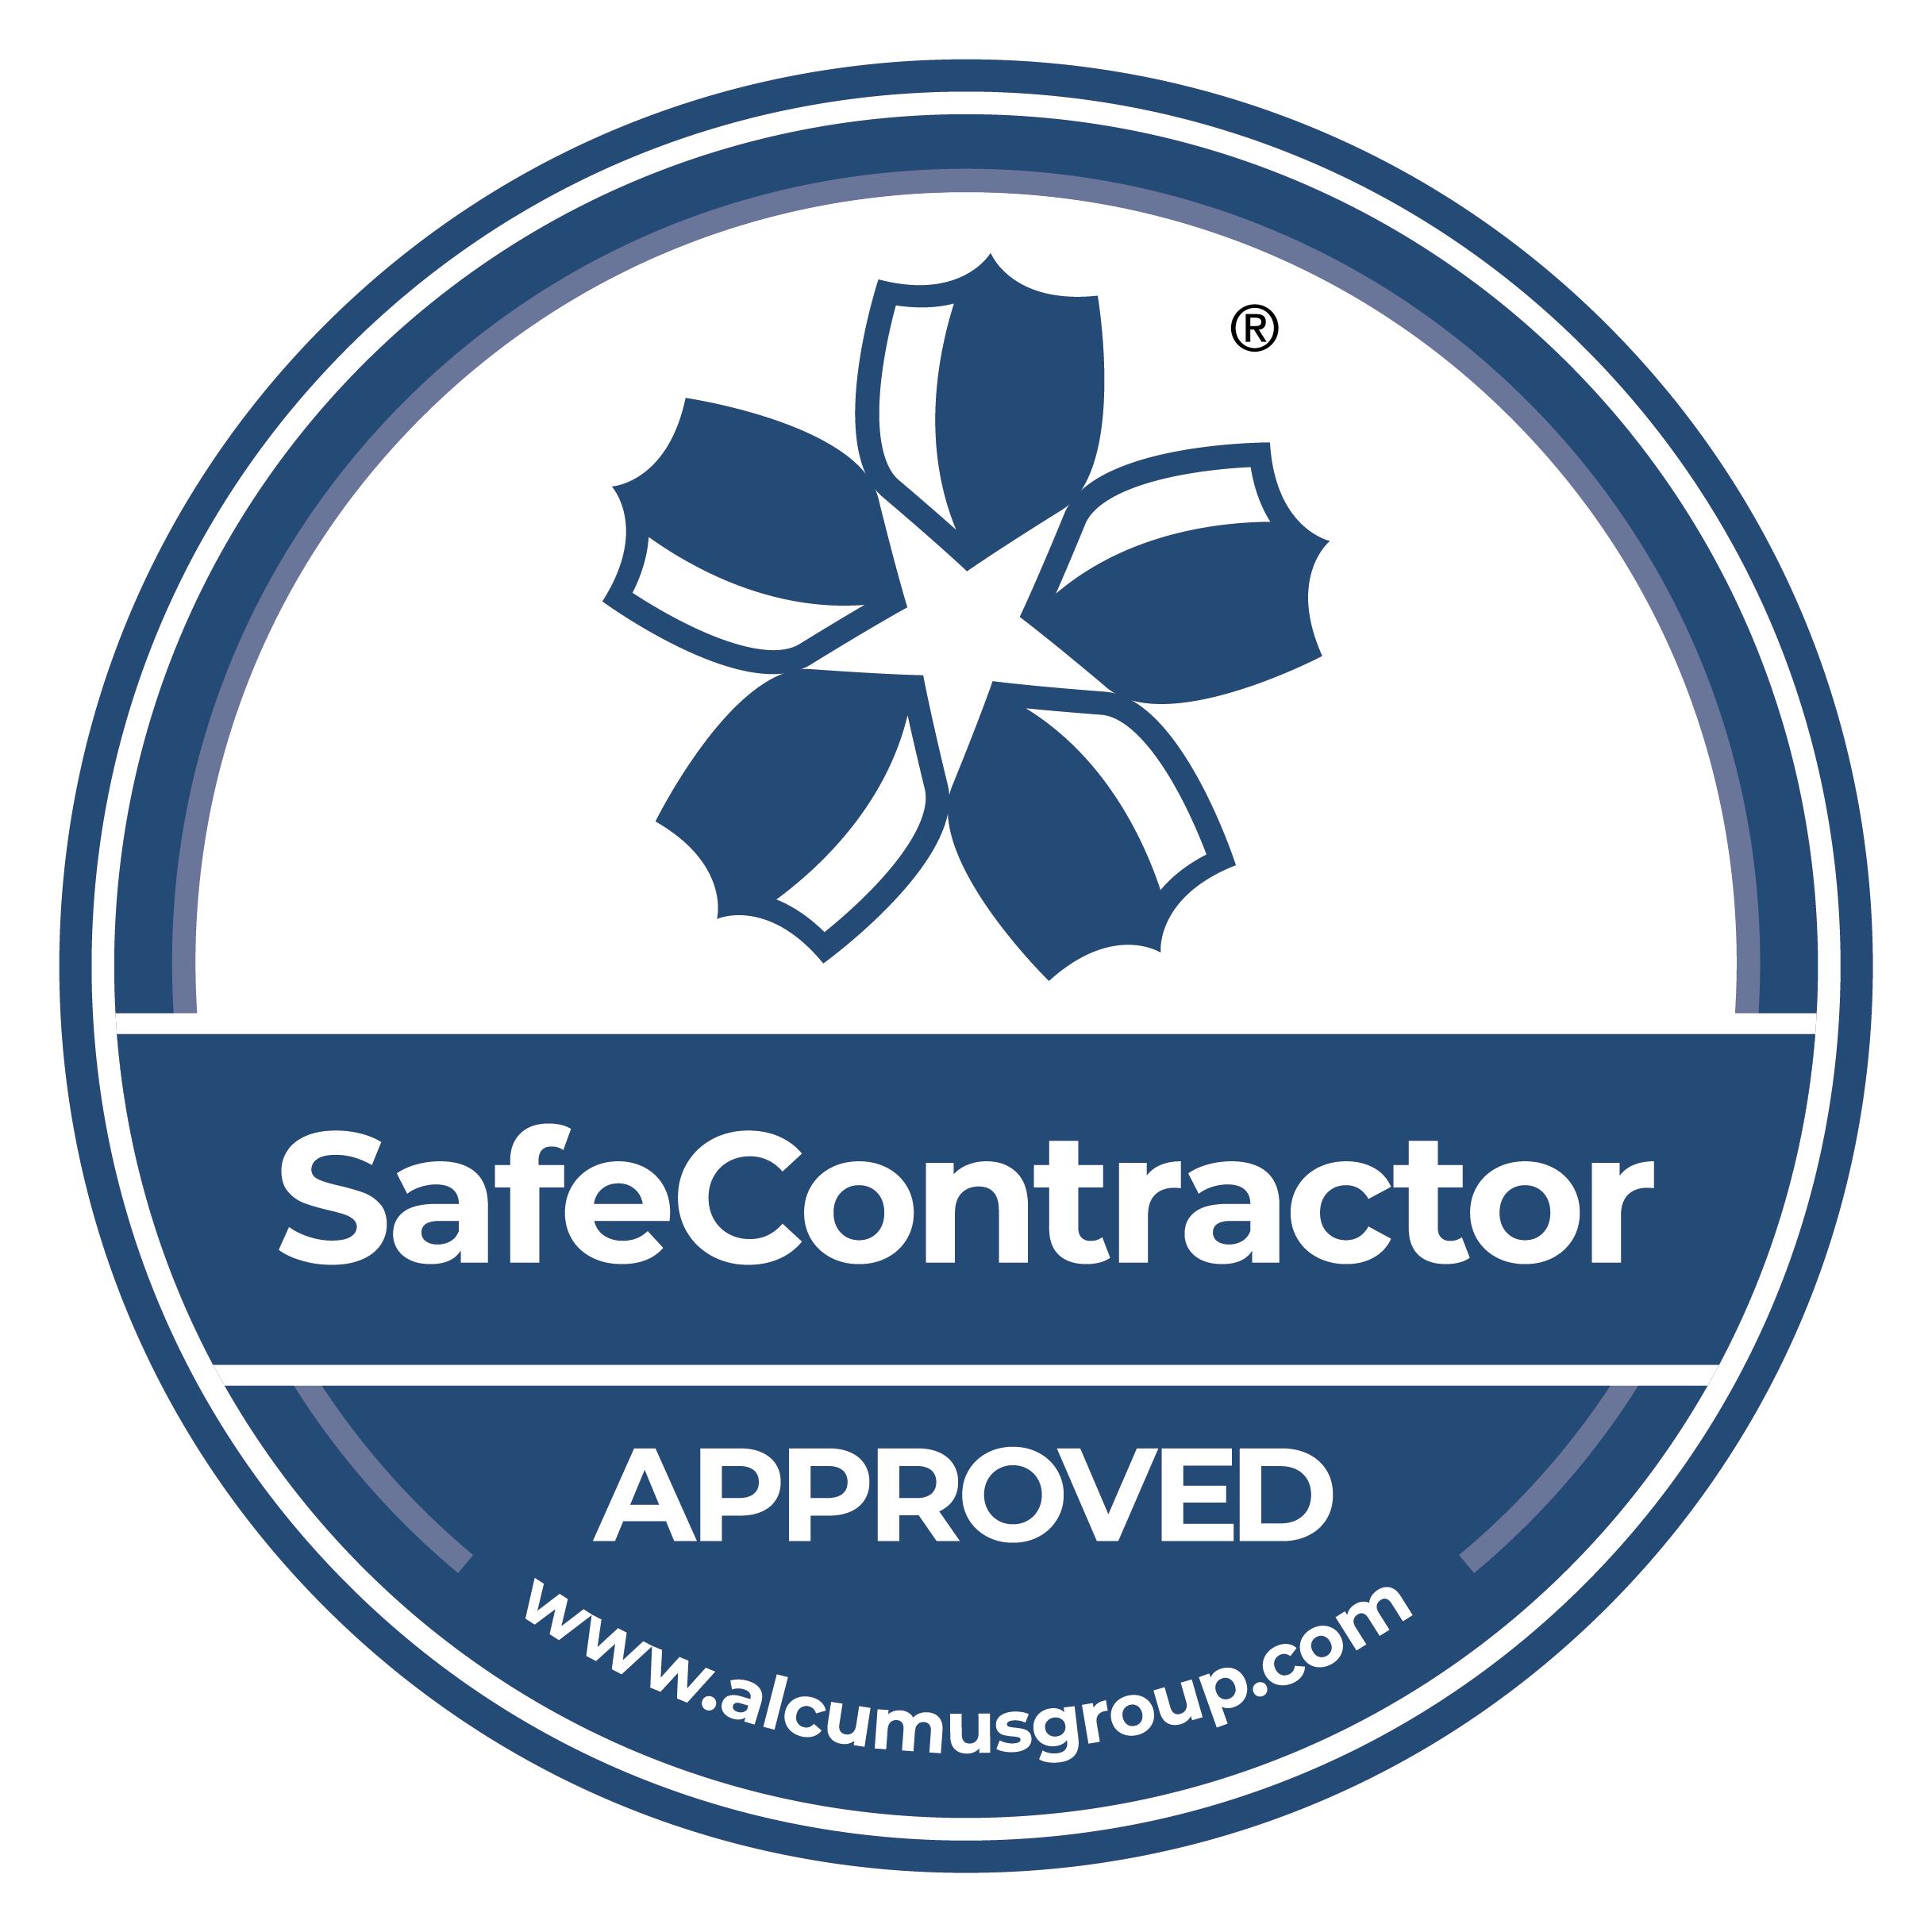 Safecontractor logo Anglia Door Systems Ltd